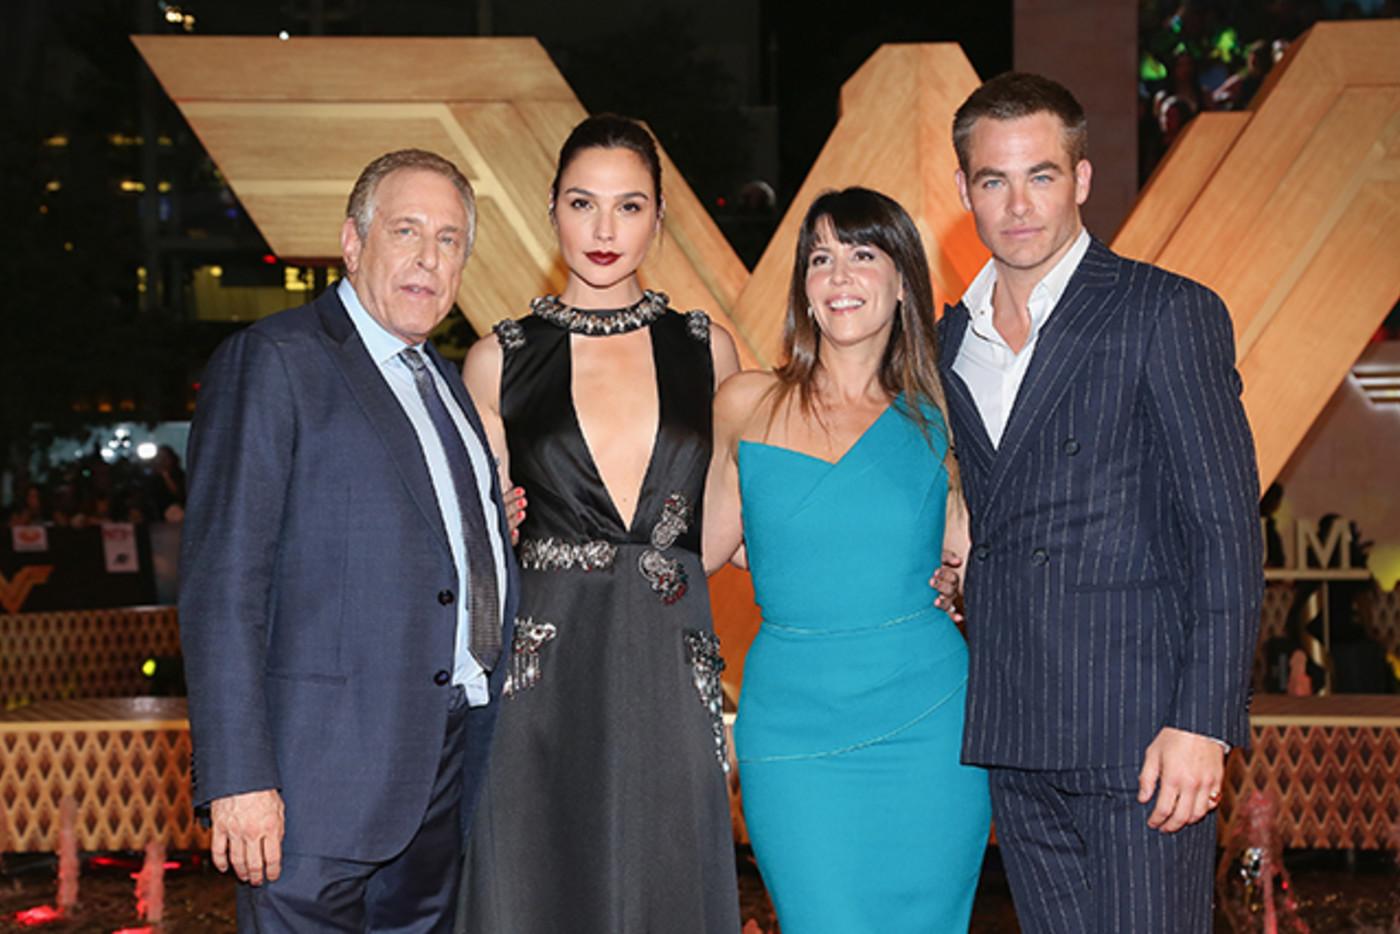 'Wonder Woman' Mexico City Premiere - Red Carpet